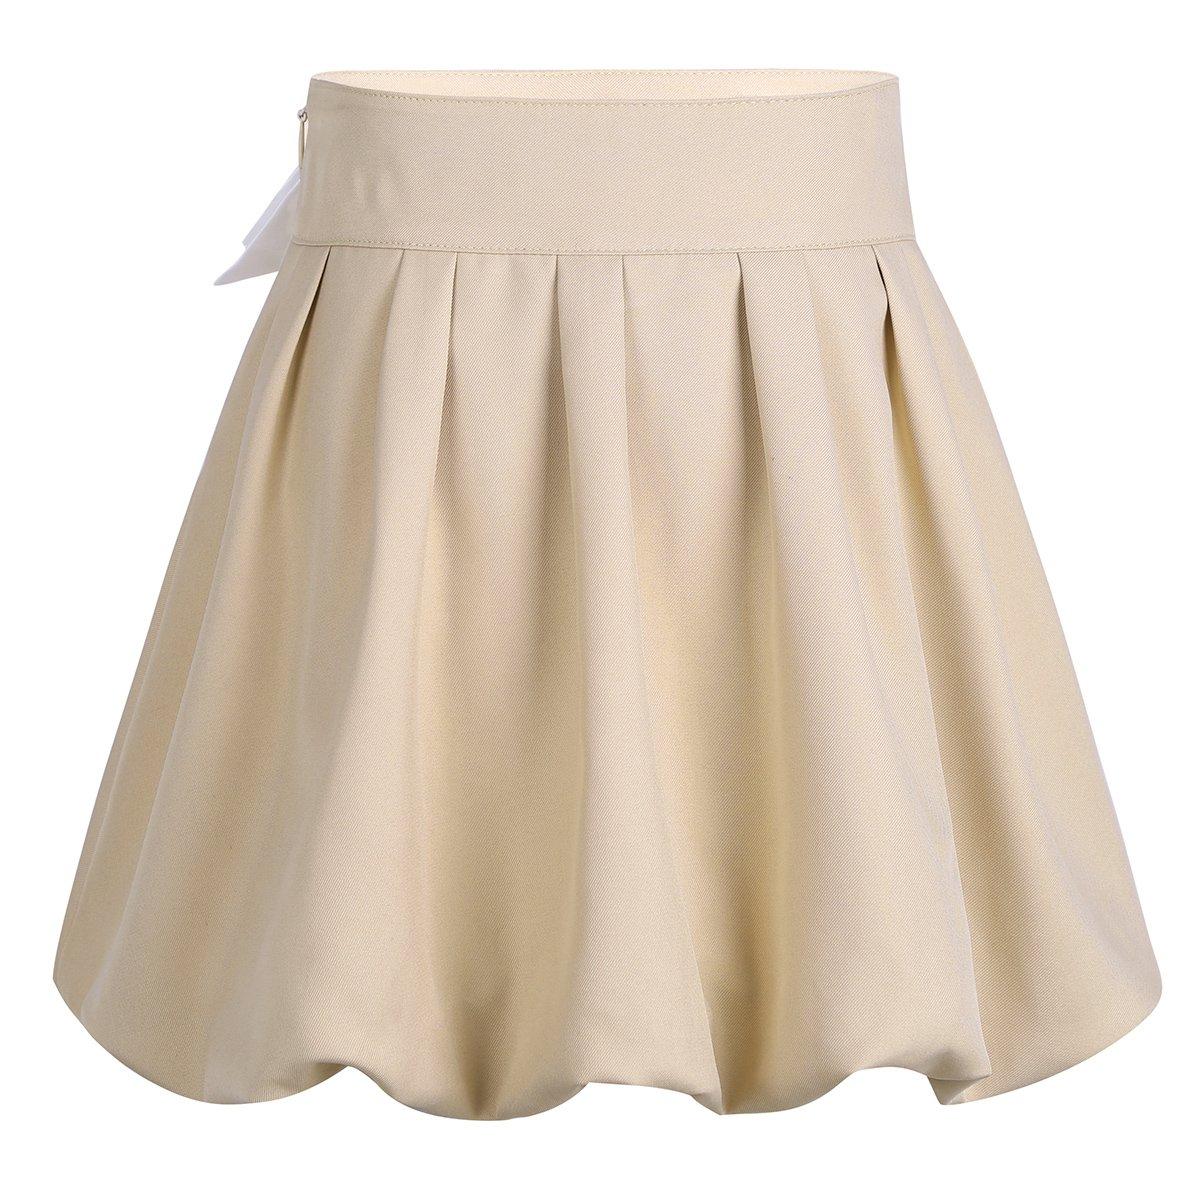 WOZOW Teen Girls Scotland Plaid School Uniform A-line High Waisted Mini Skirts Cotton Skirt